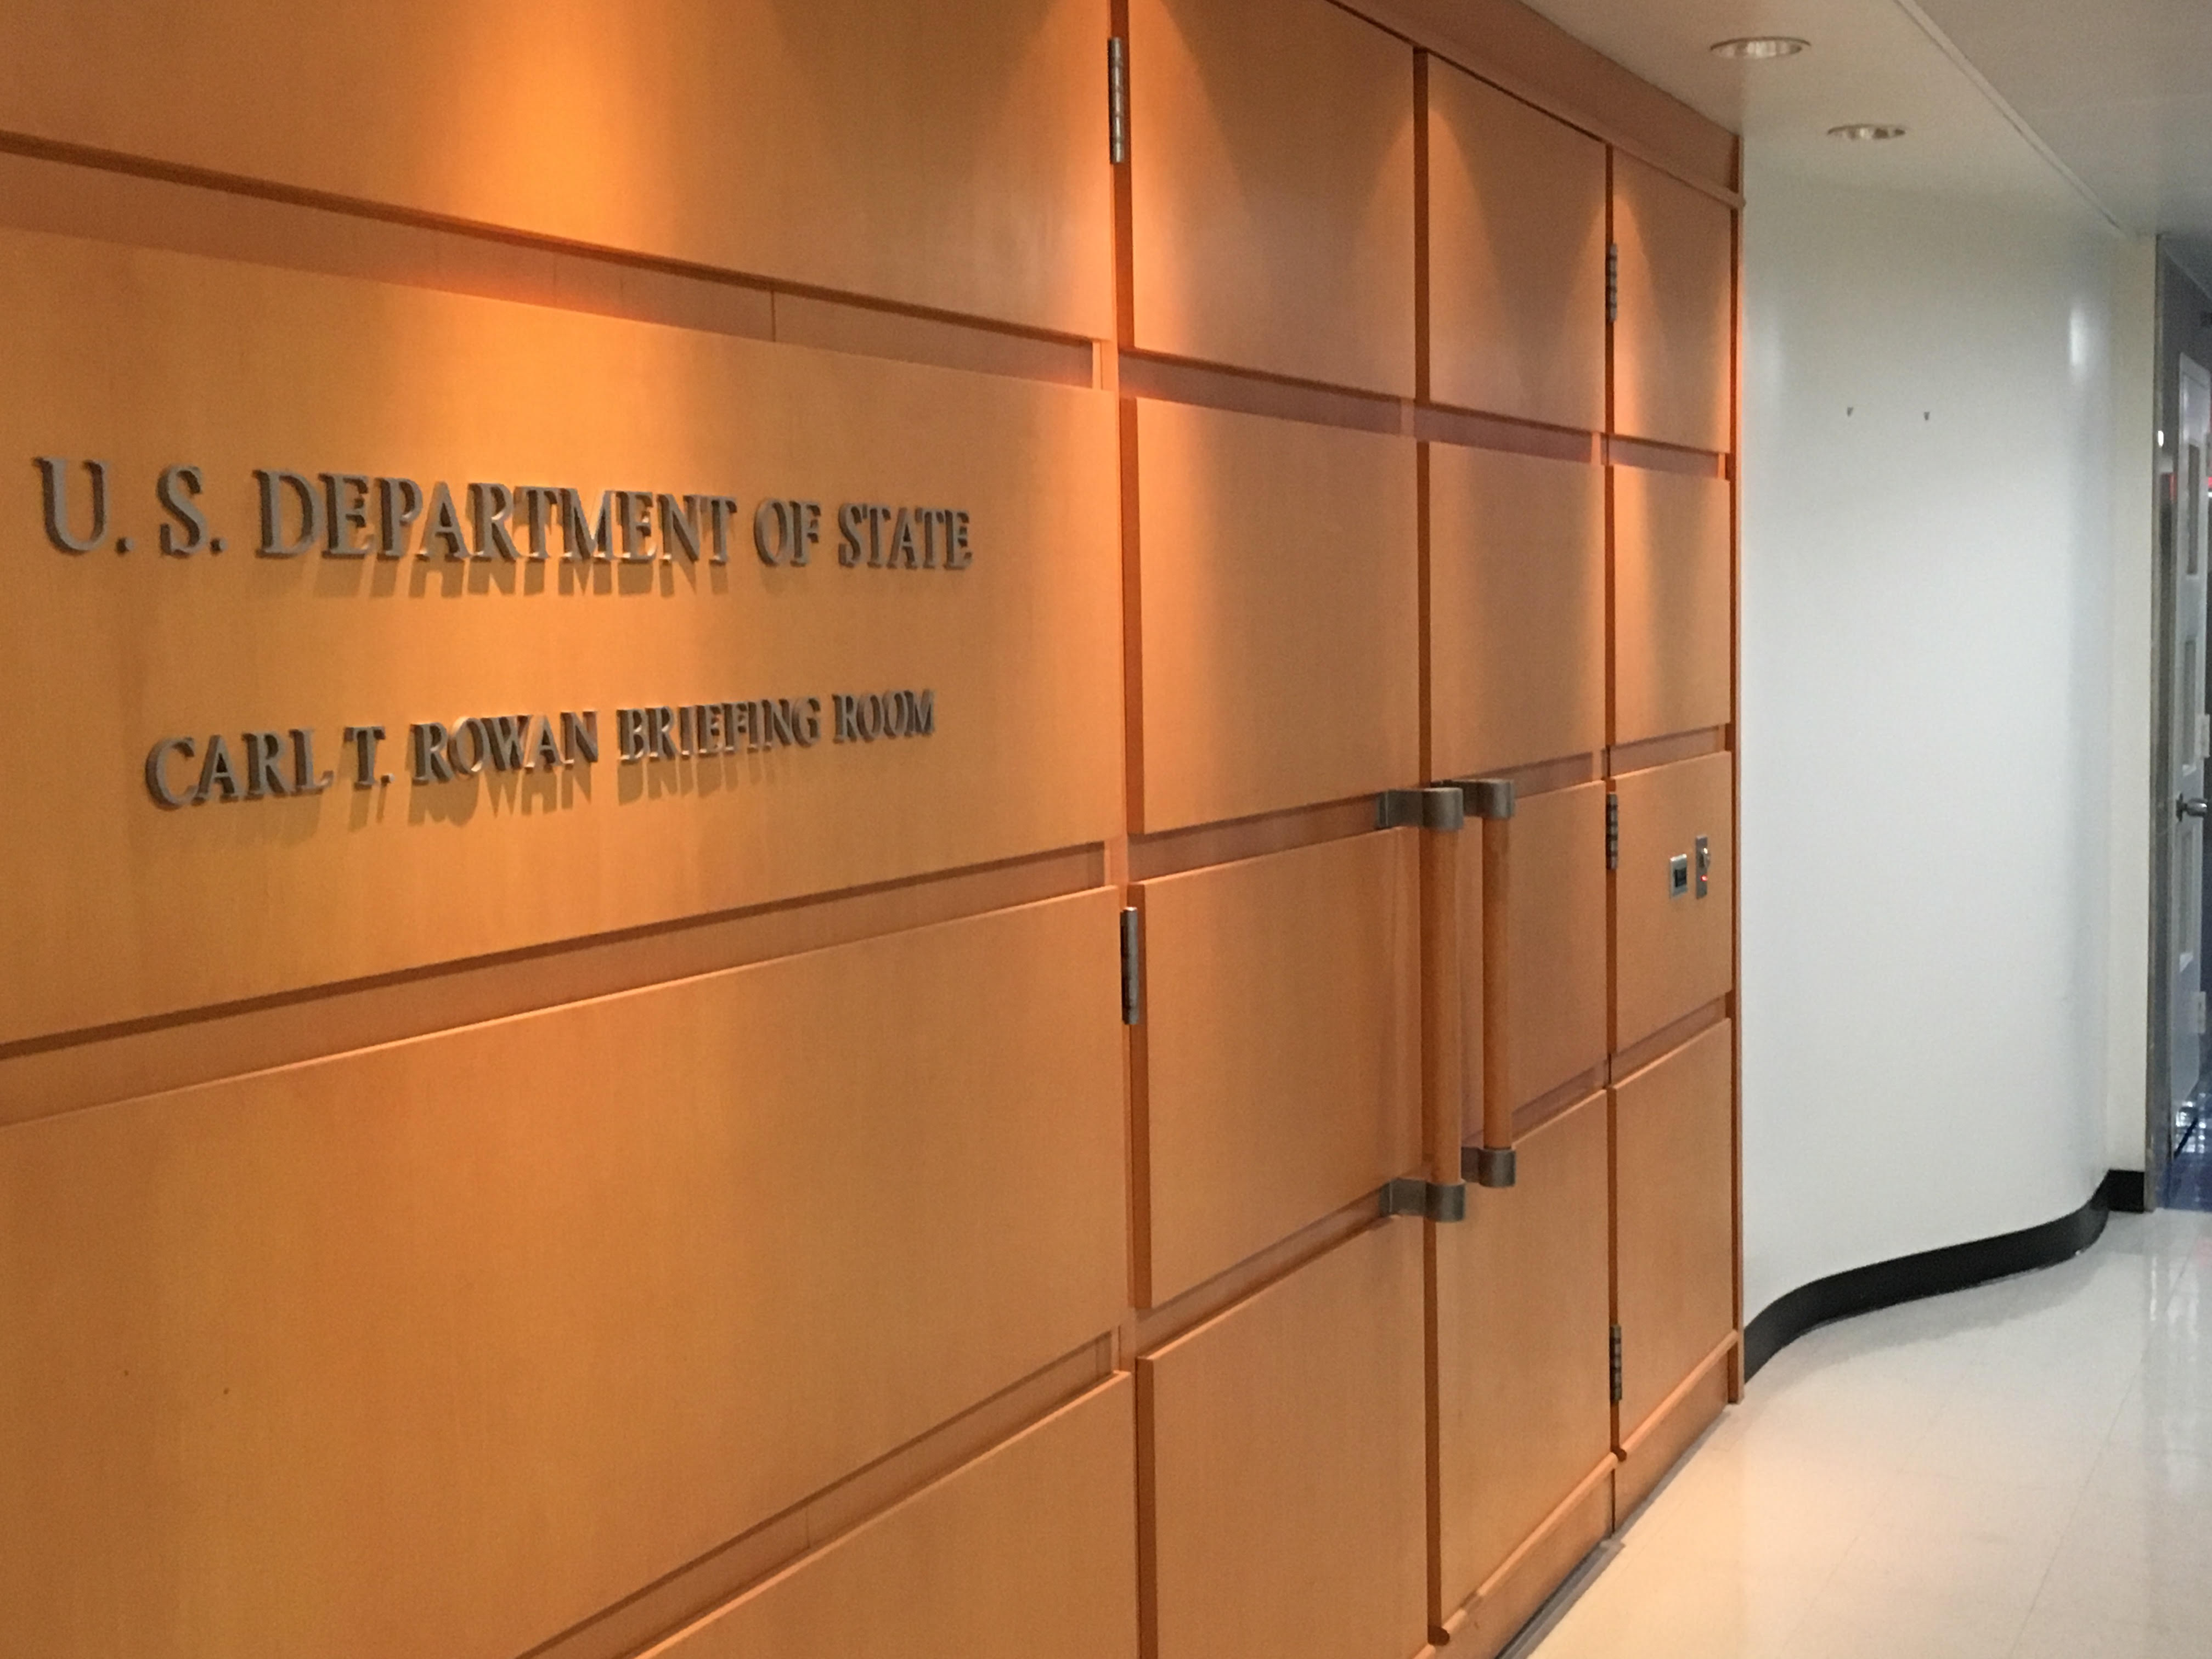 State Deoartnetb Briefing Room door